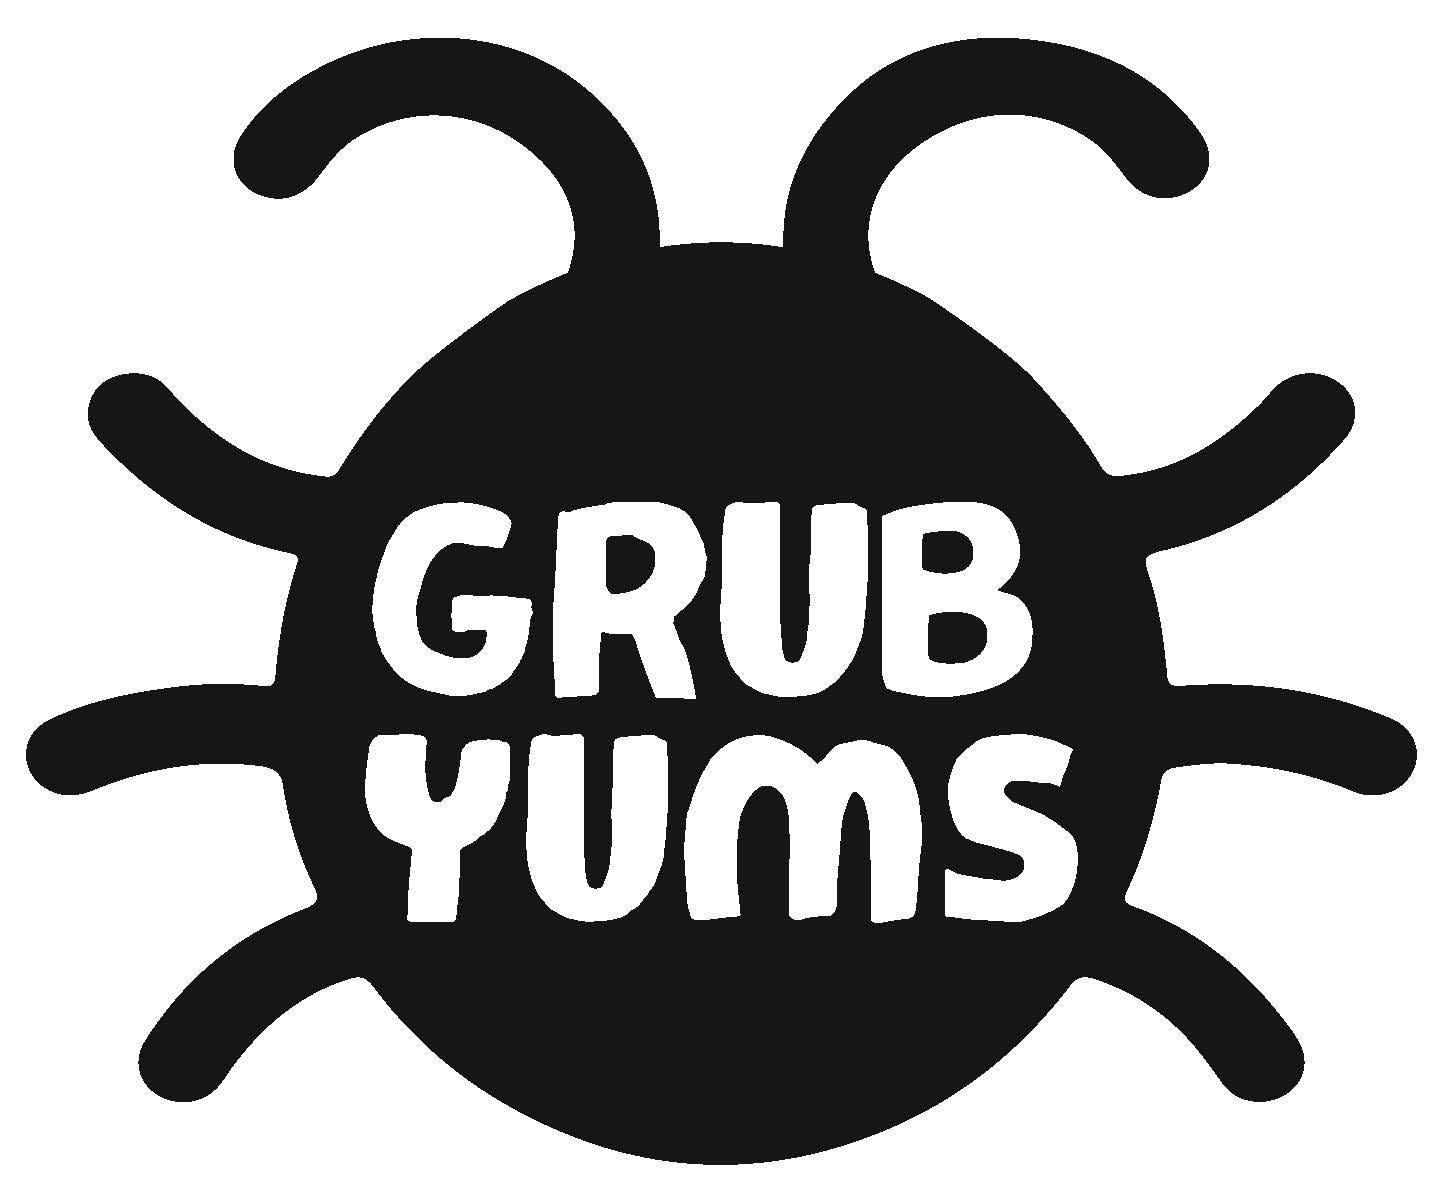 GrubYums.jpg